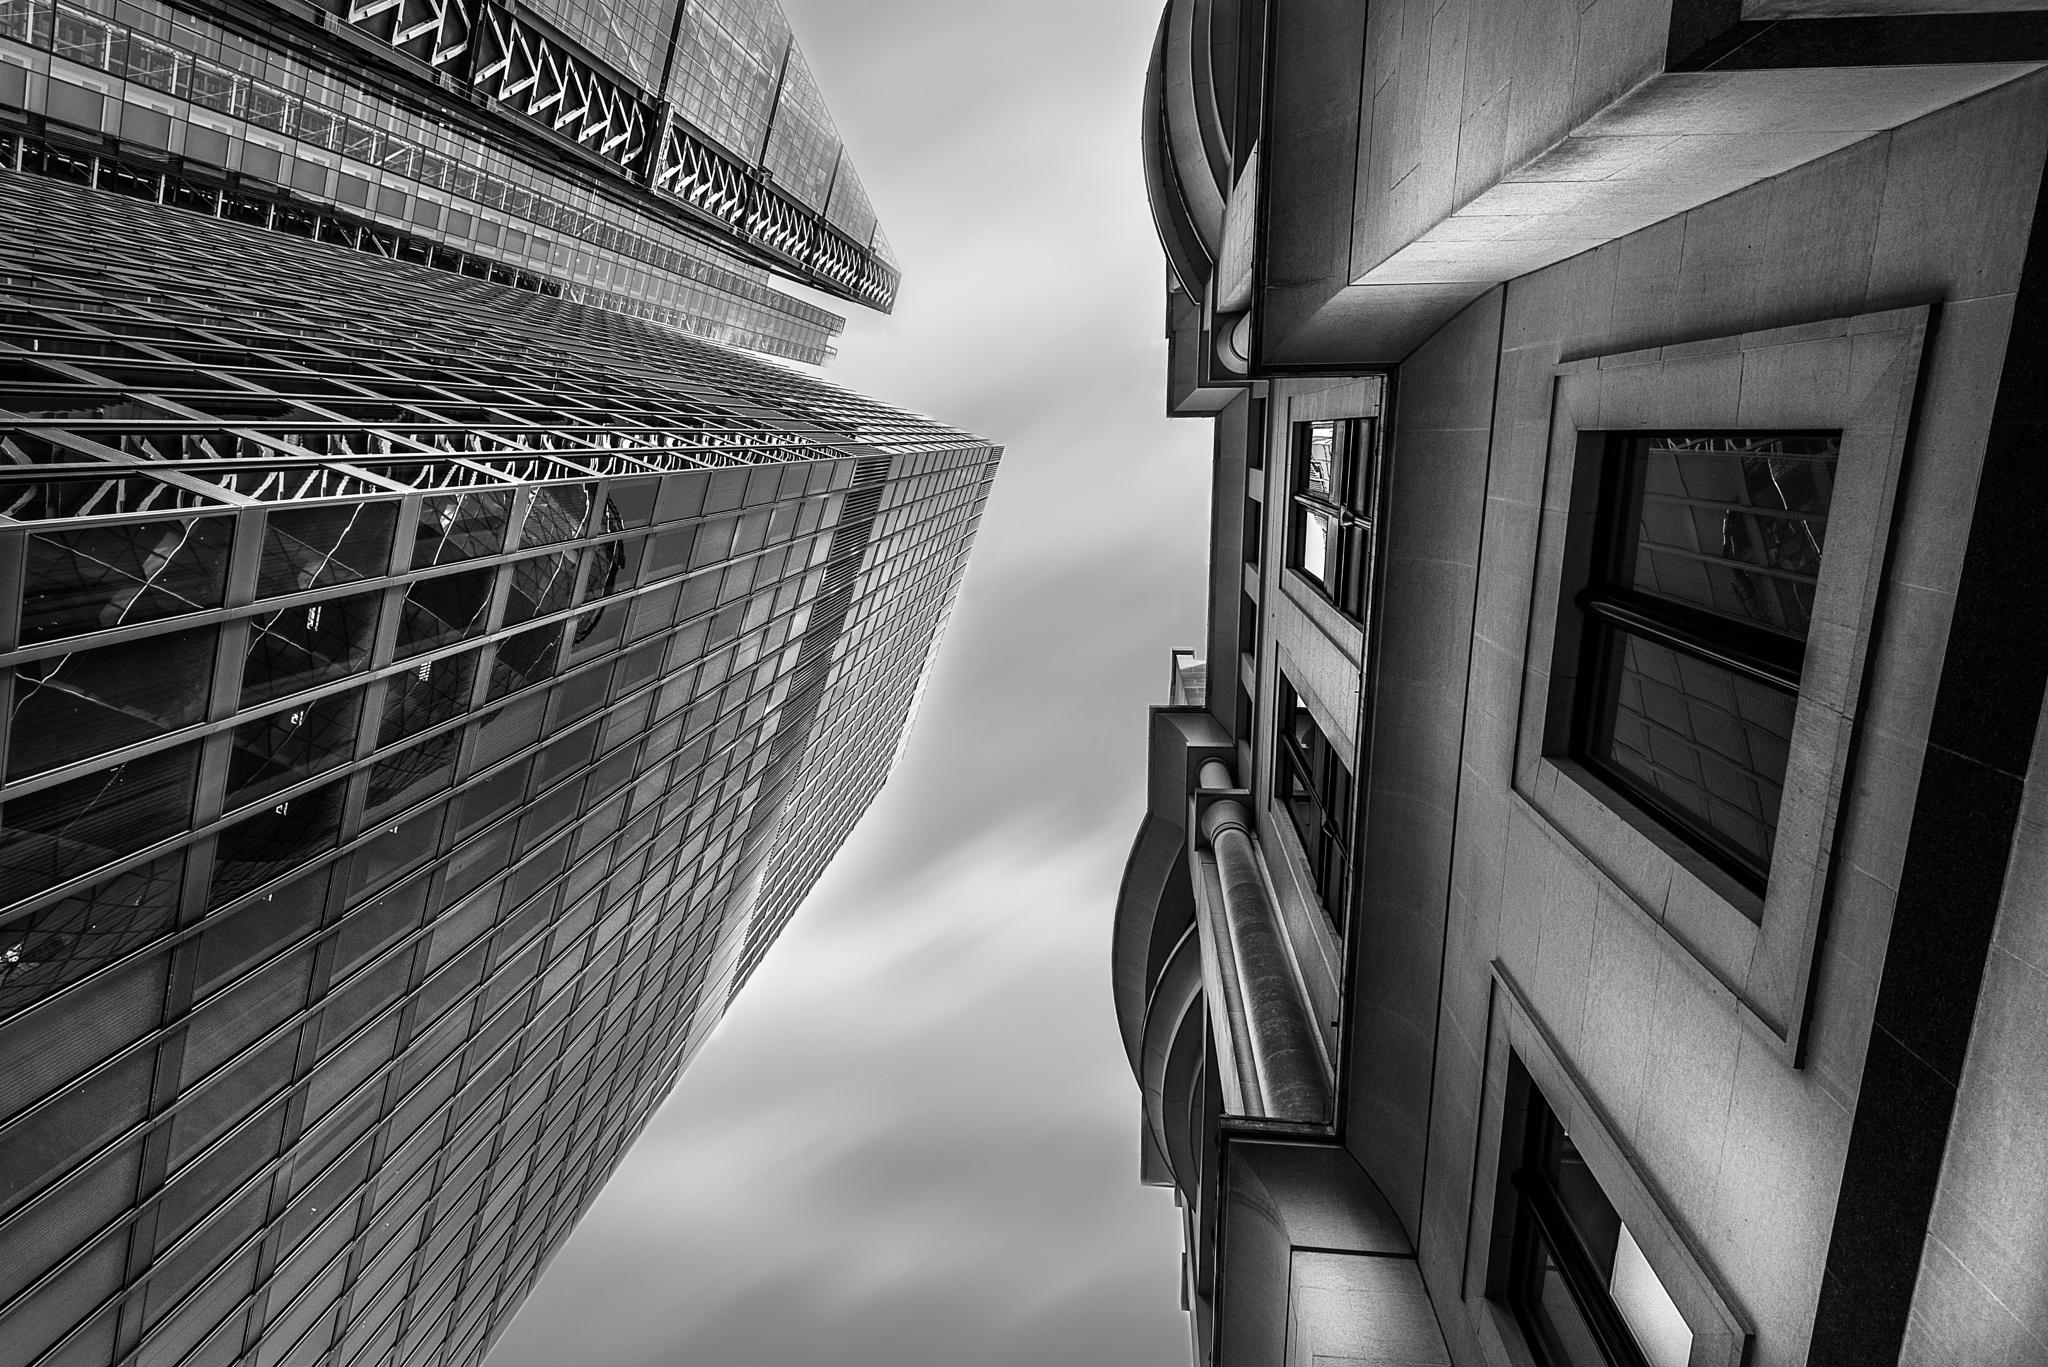 London skyward by Alec Hickman